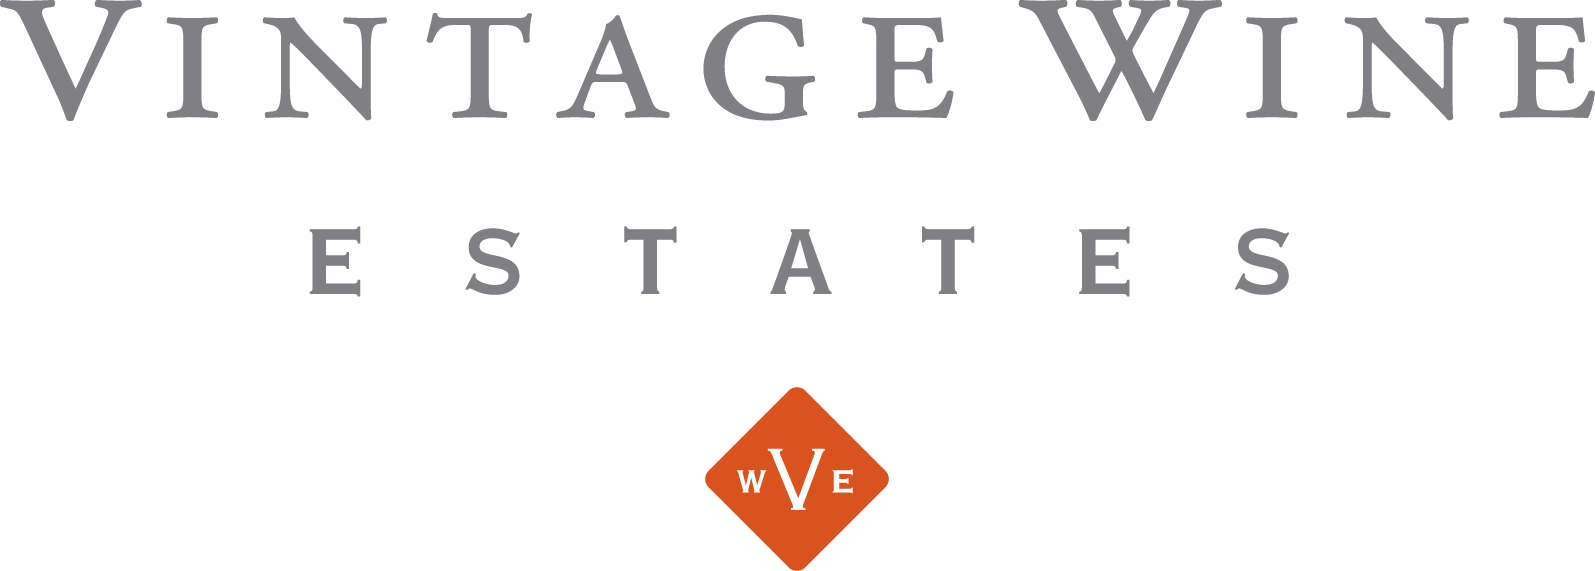 Giới thiệu VINTAGE WINE ESTATES